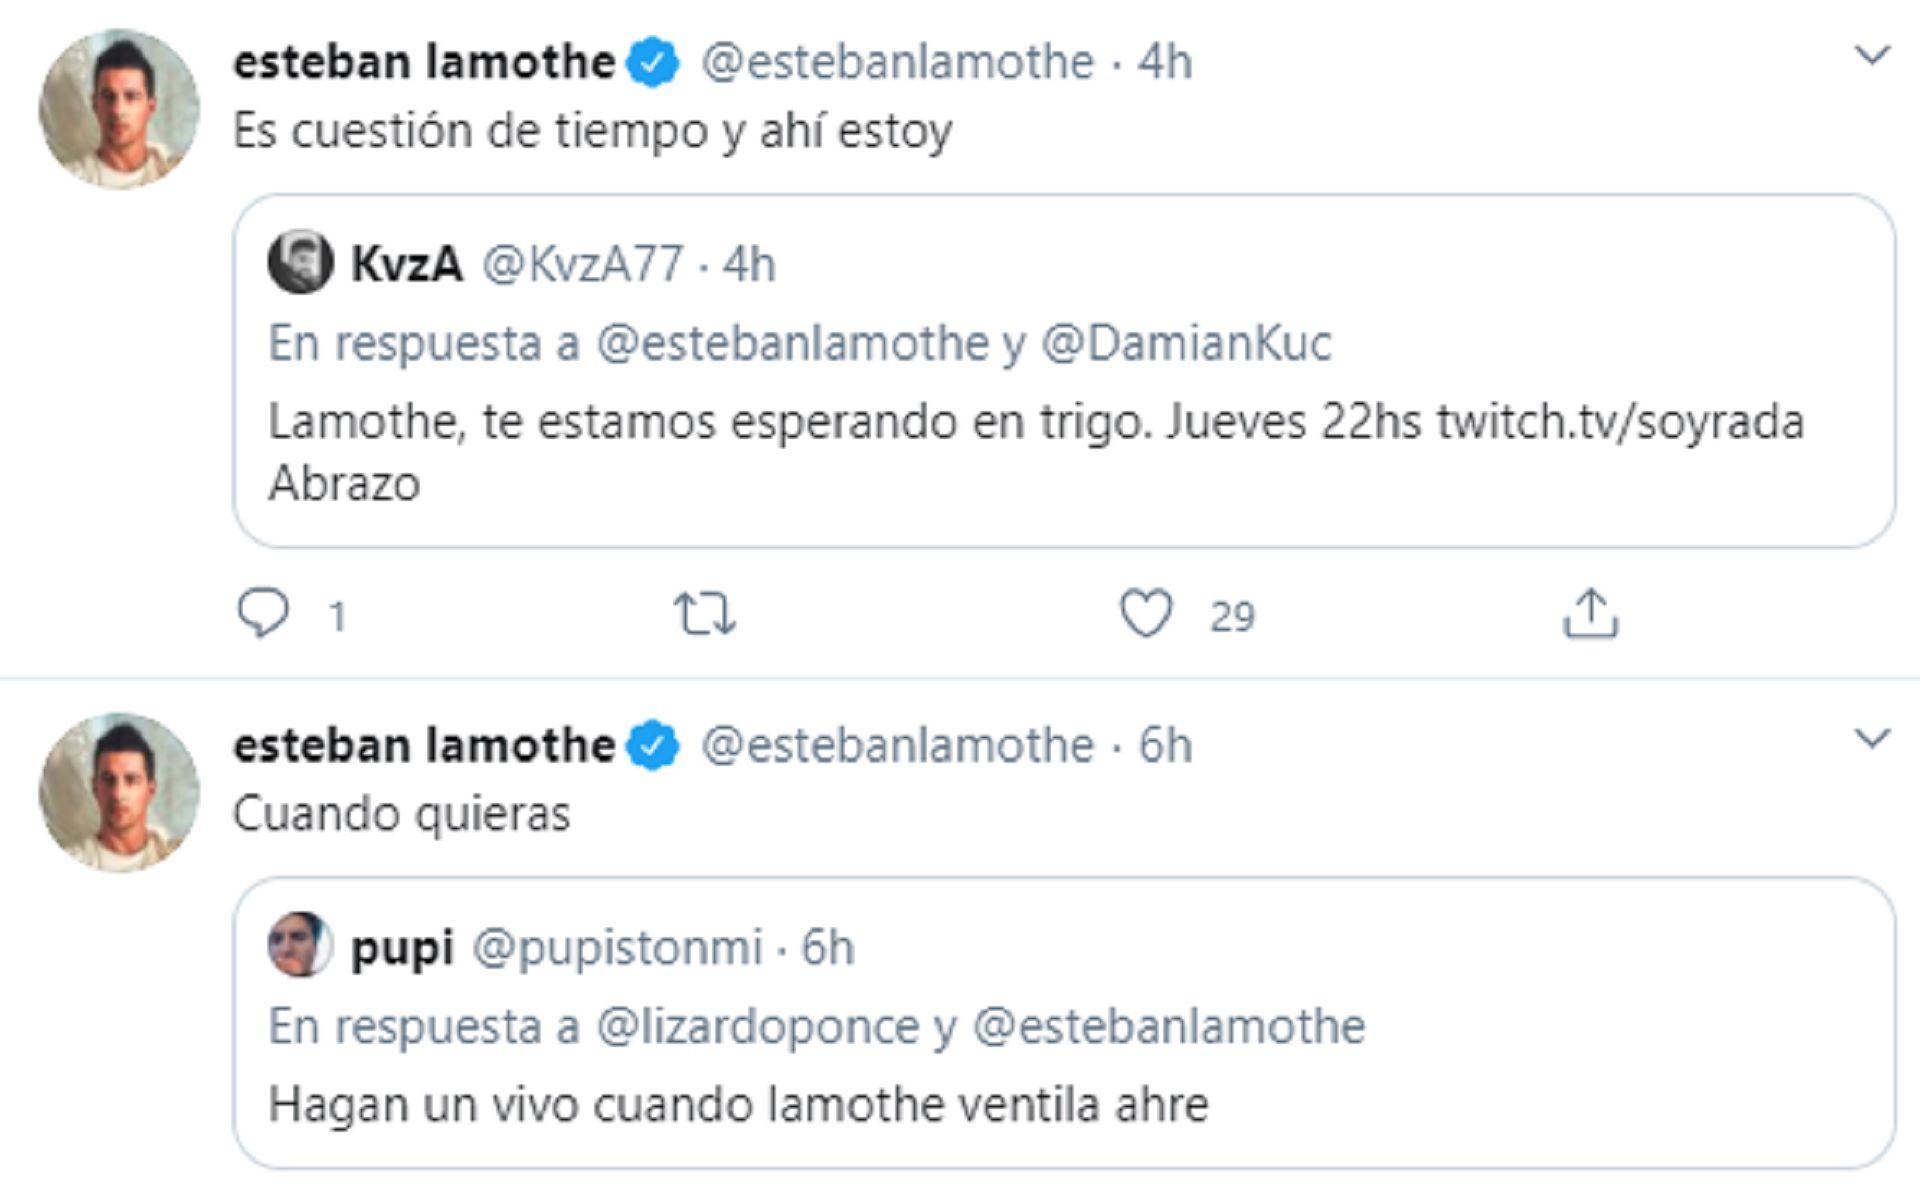 Los tuits de Esteban Lamothe